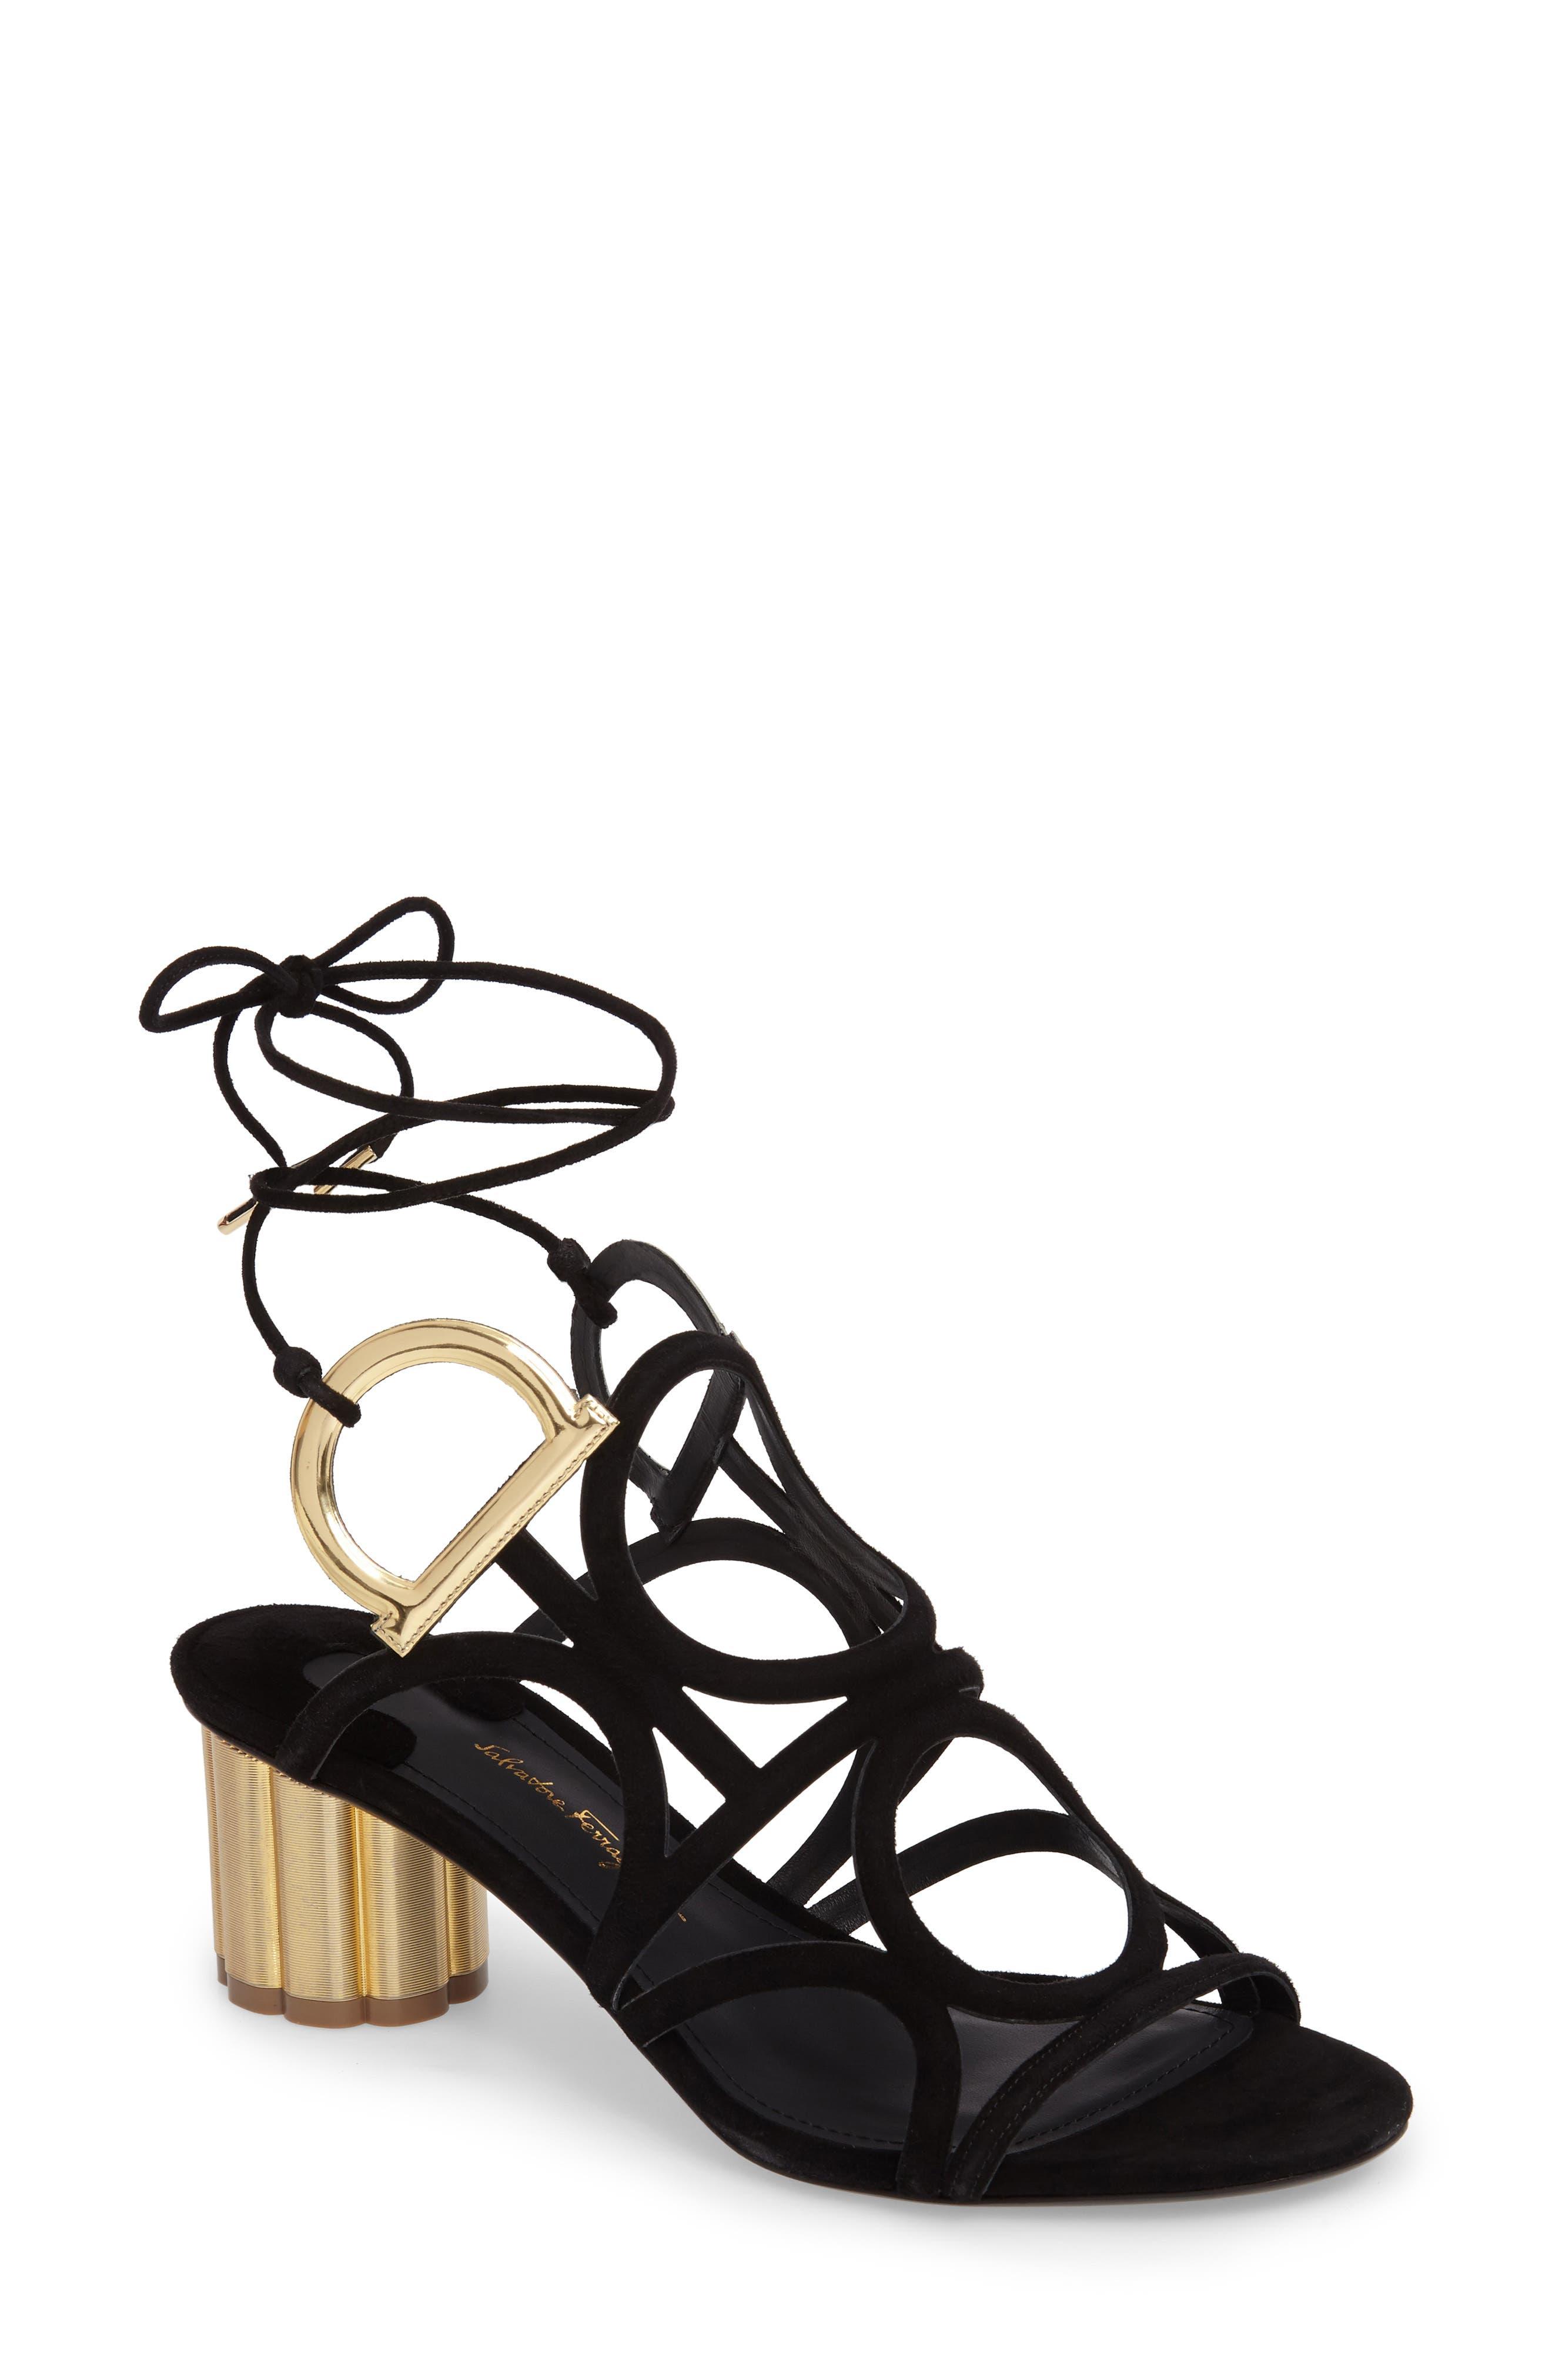 Alternate Image 1 Selected - Salvatore Ferragamo Vinci Sandal (Women)